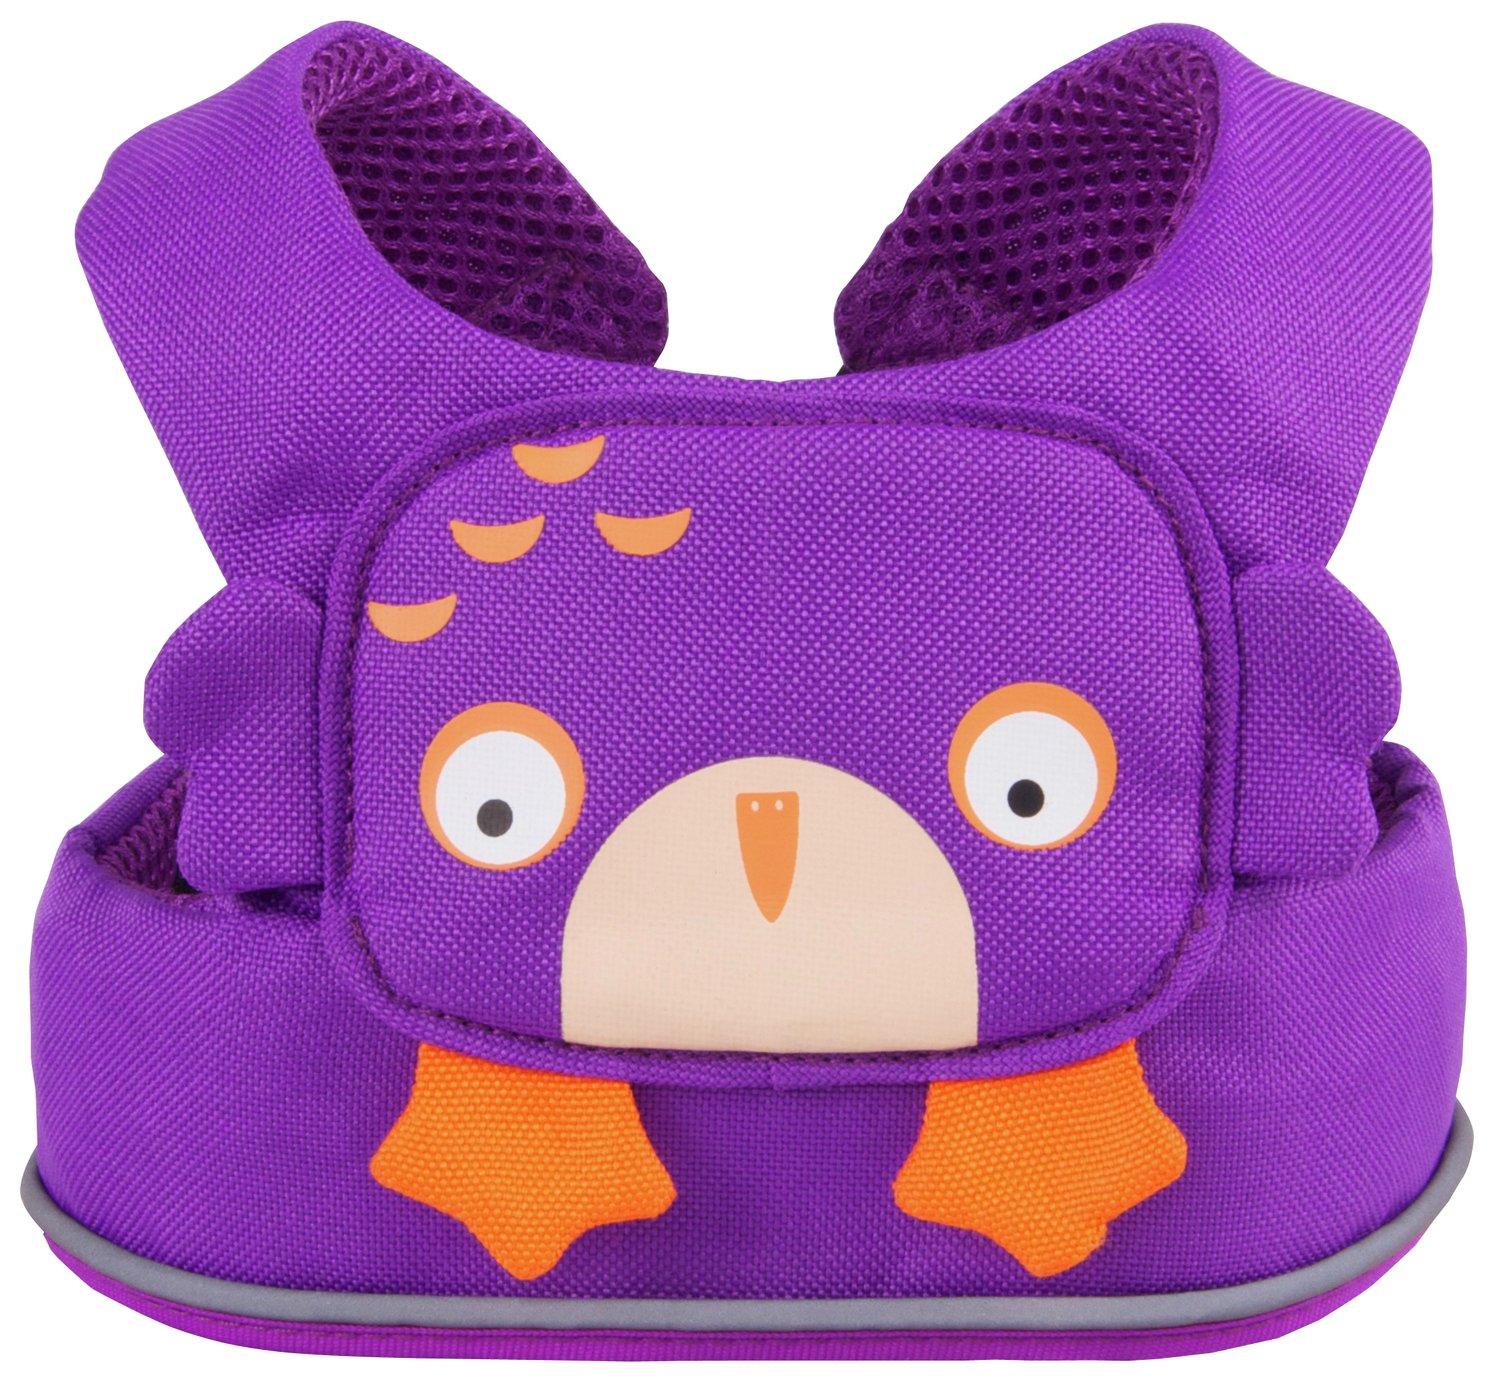 Trunki Toddlepak Reins - Purple Ollie